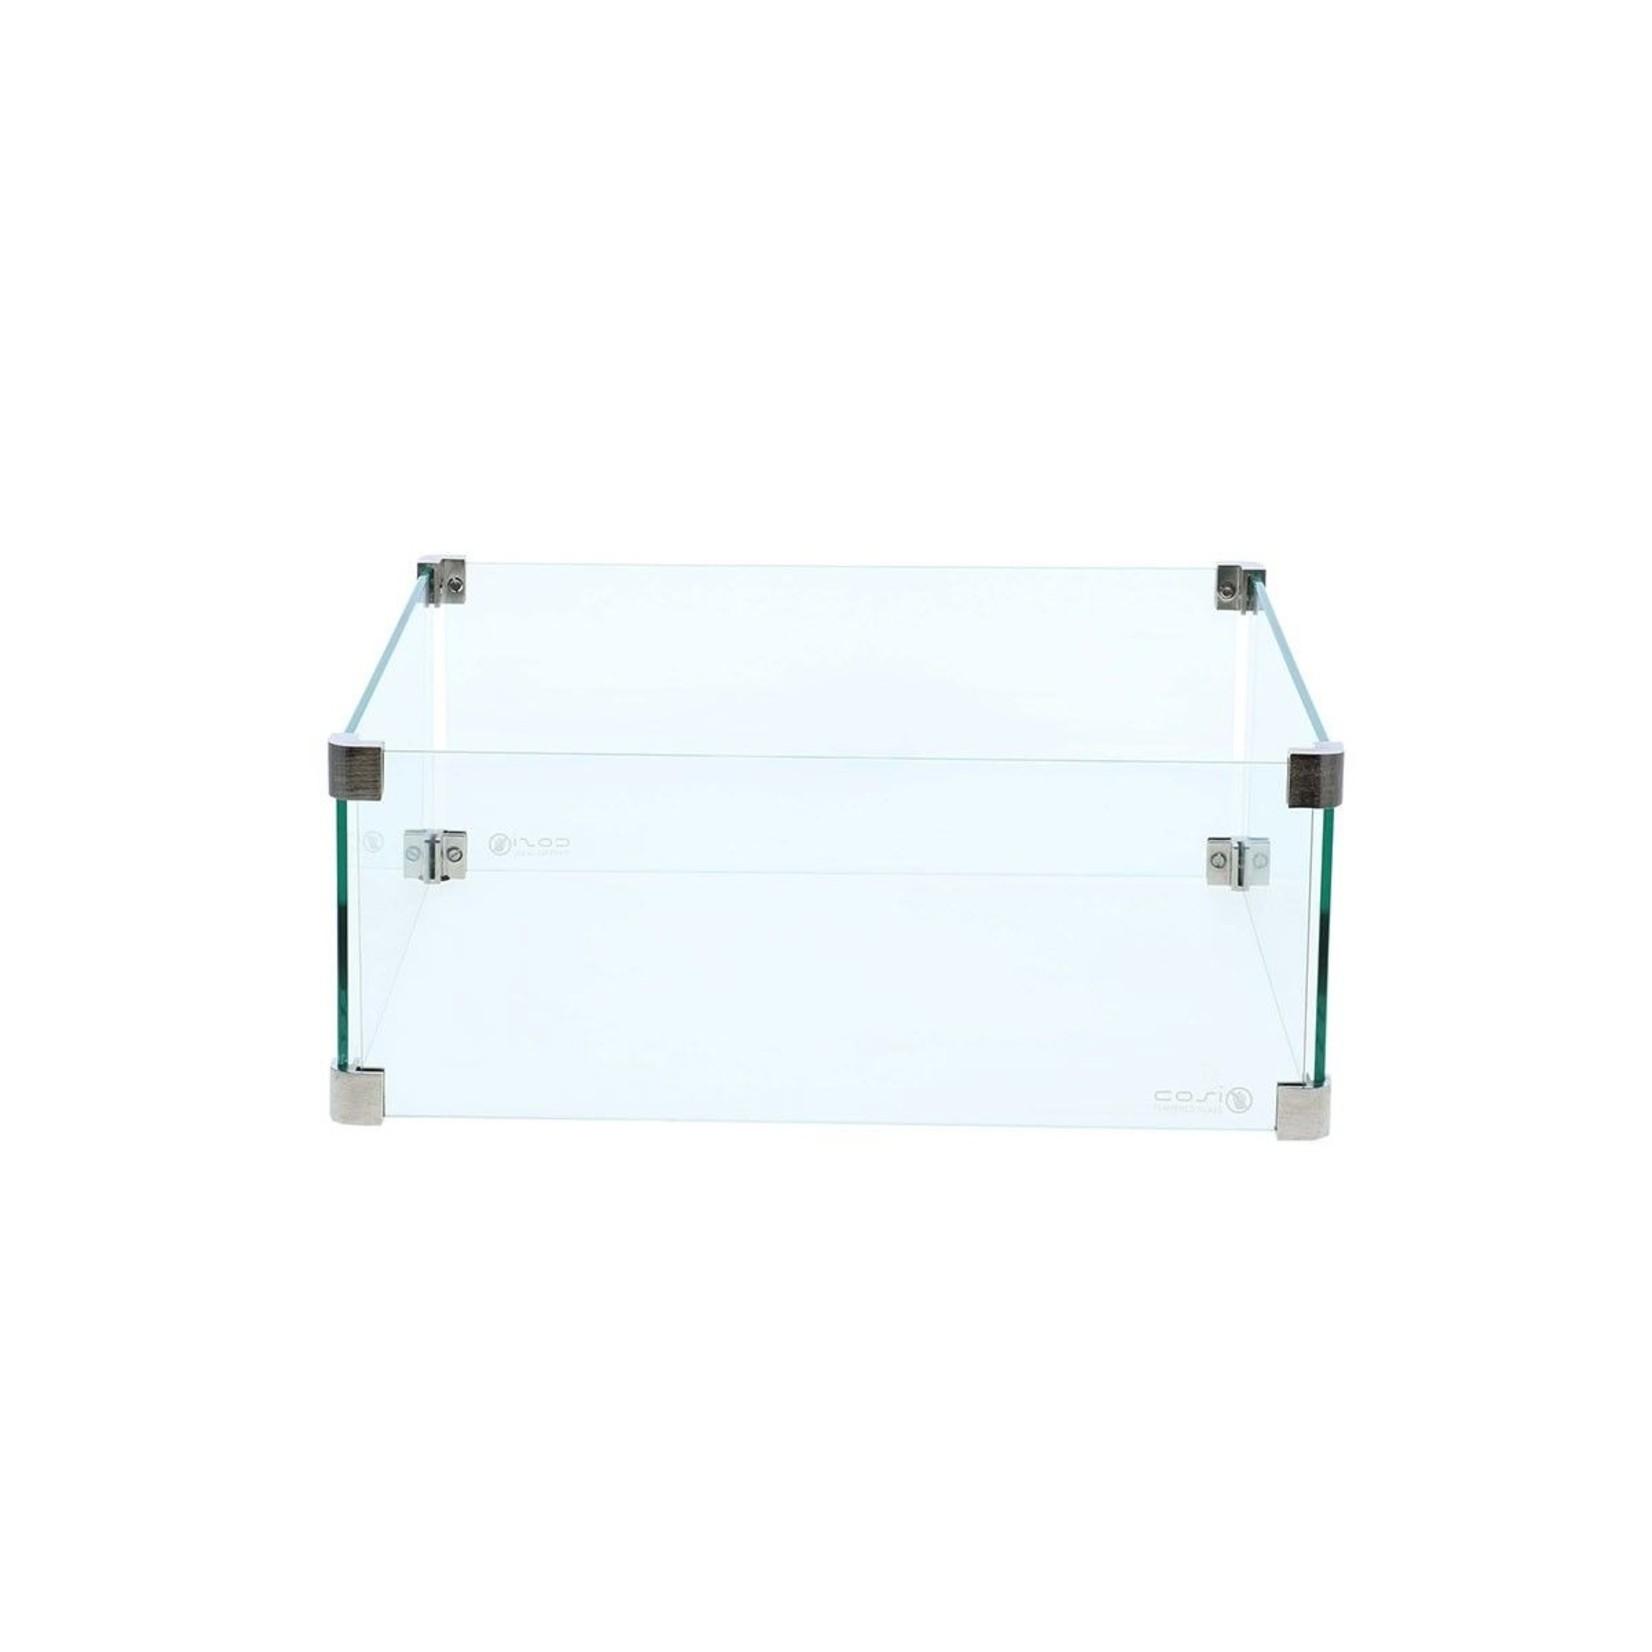 Cosi square L glasset